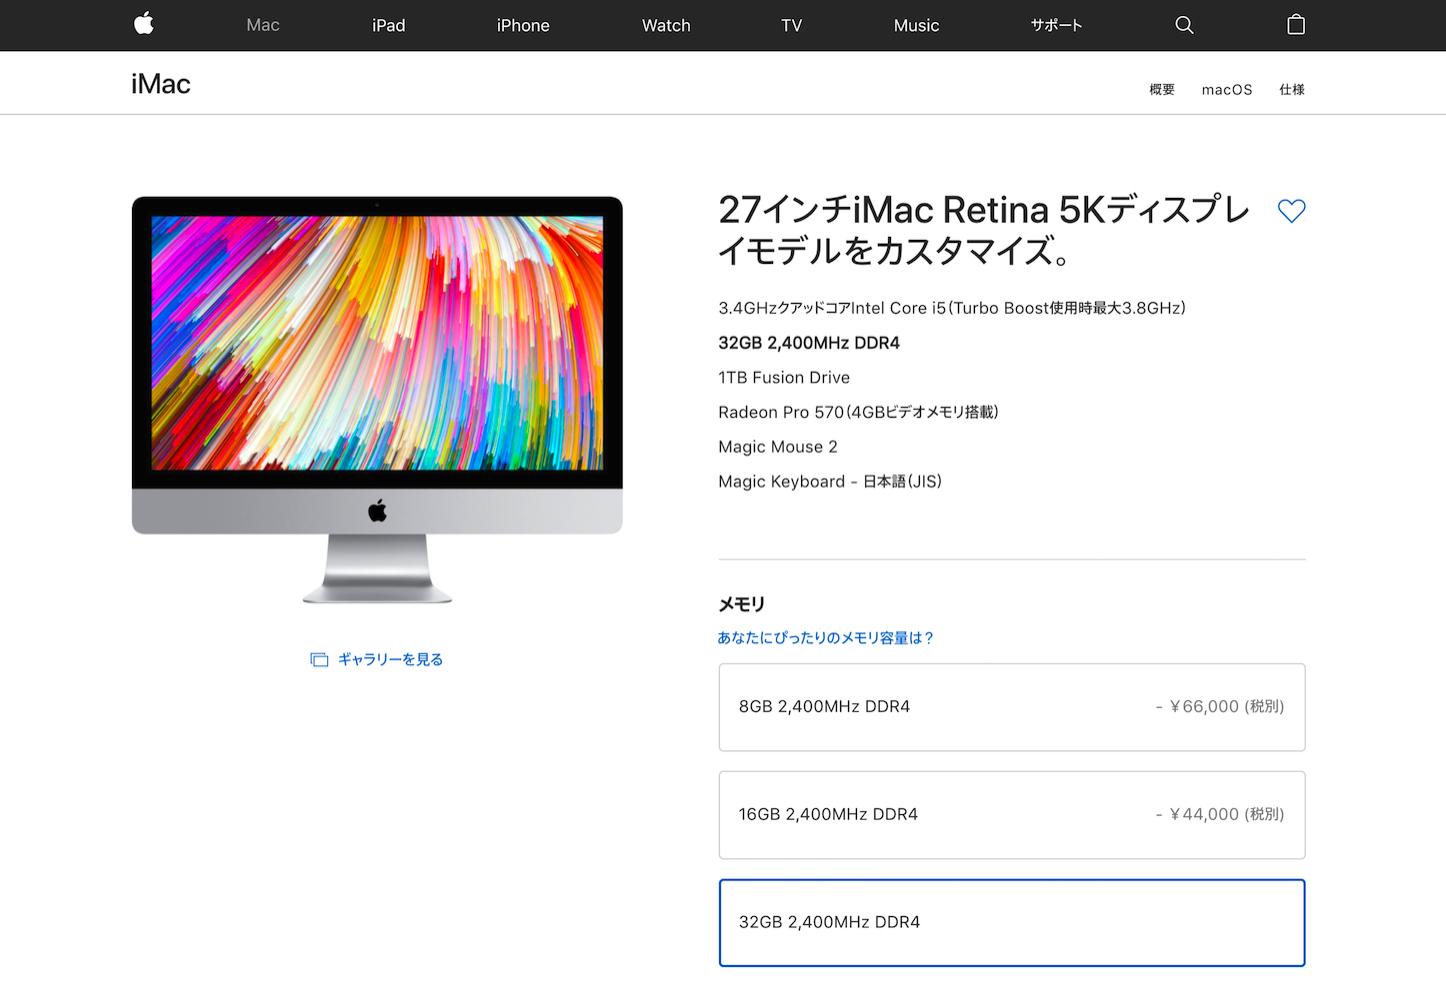 MAX RAM on iMac 2017